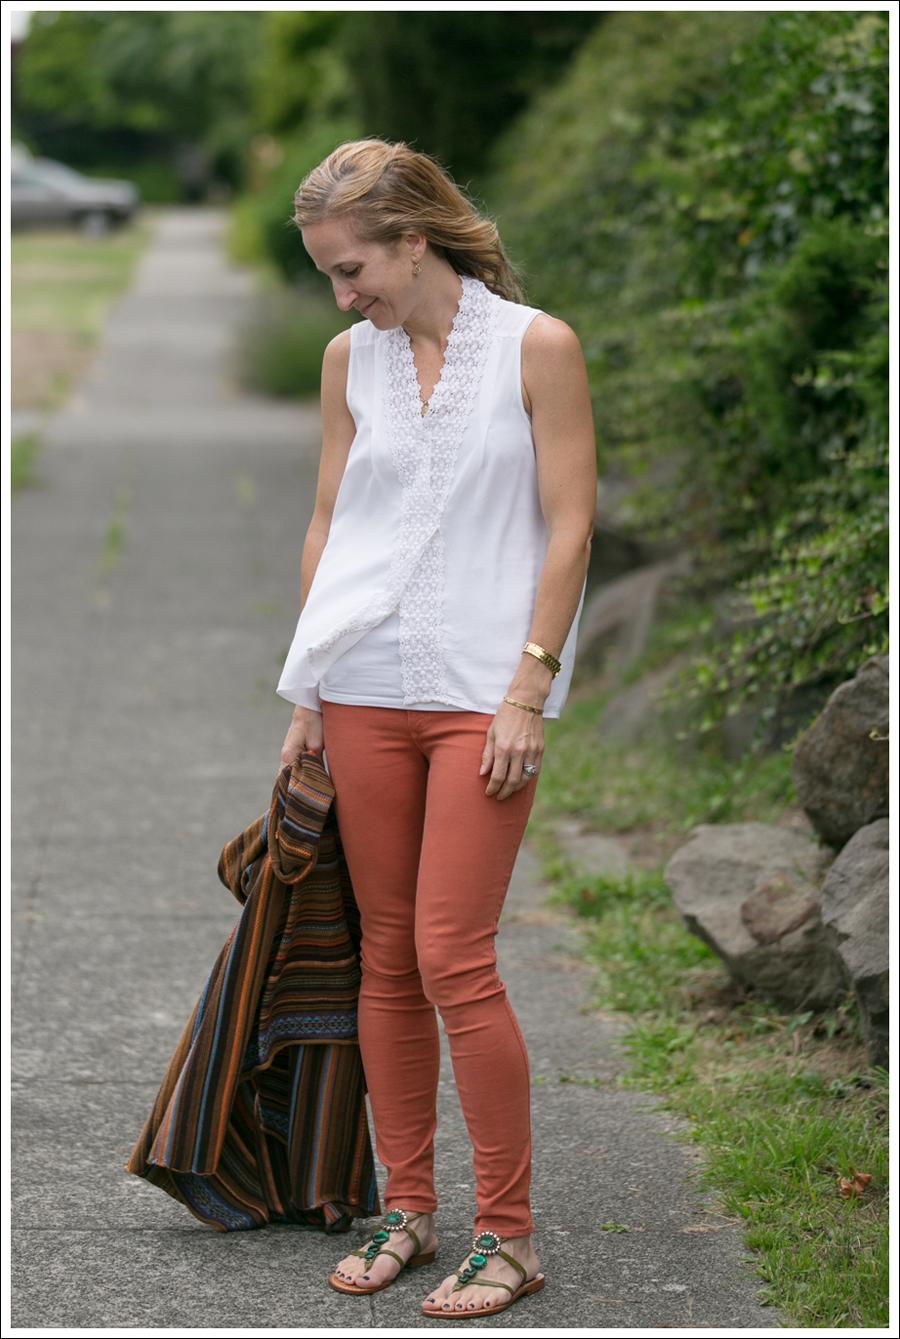 blogOrange Black Orchid Jeans White Top Pattern Swing Sweater-1